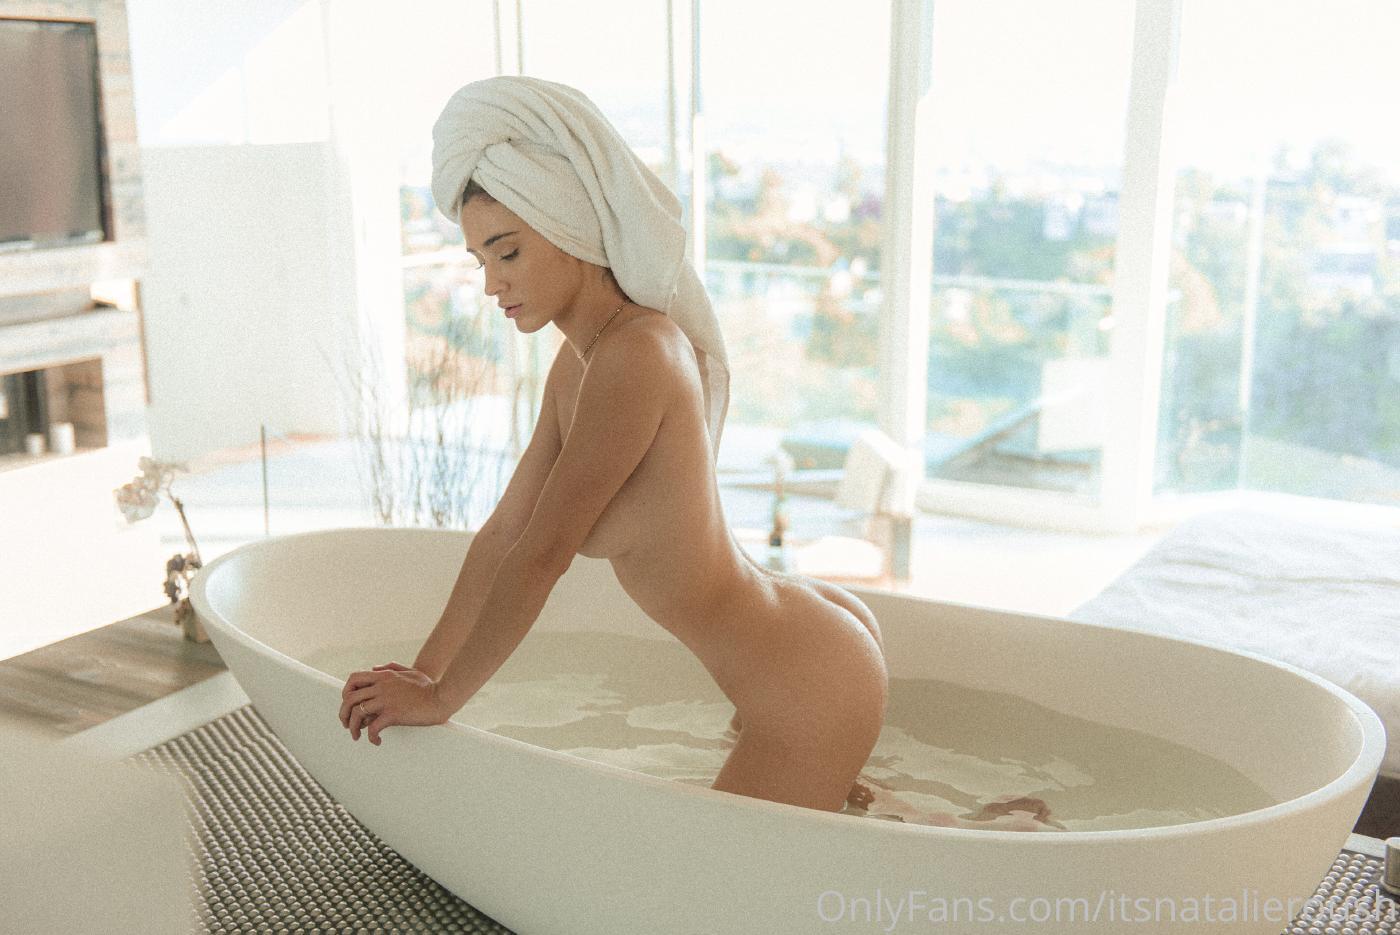 Natalie Roush Nude Bath Onlyfans Set Leaked 0002